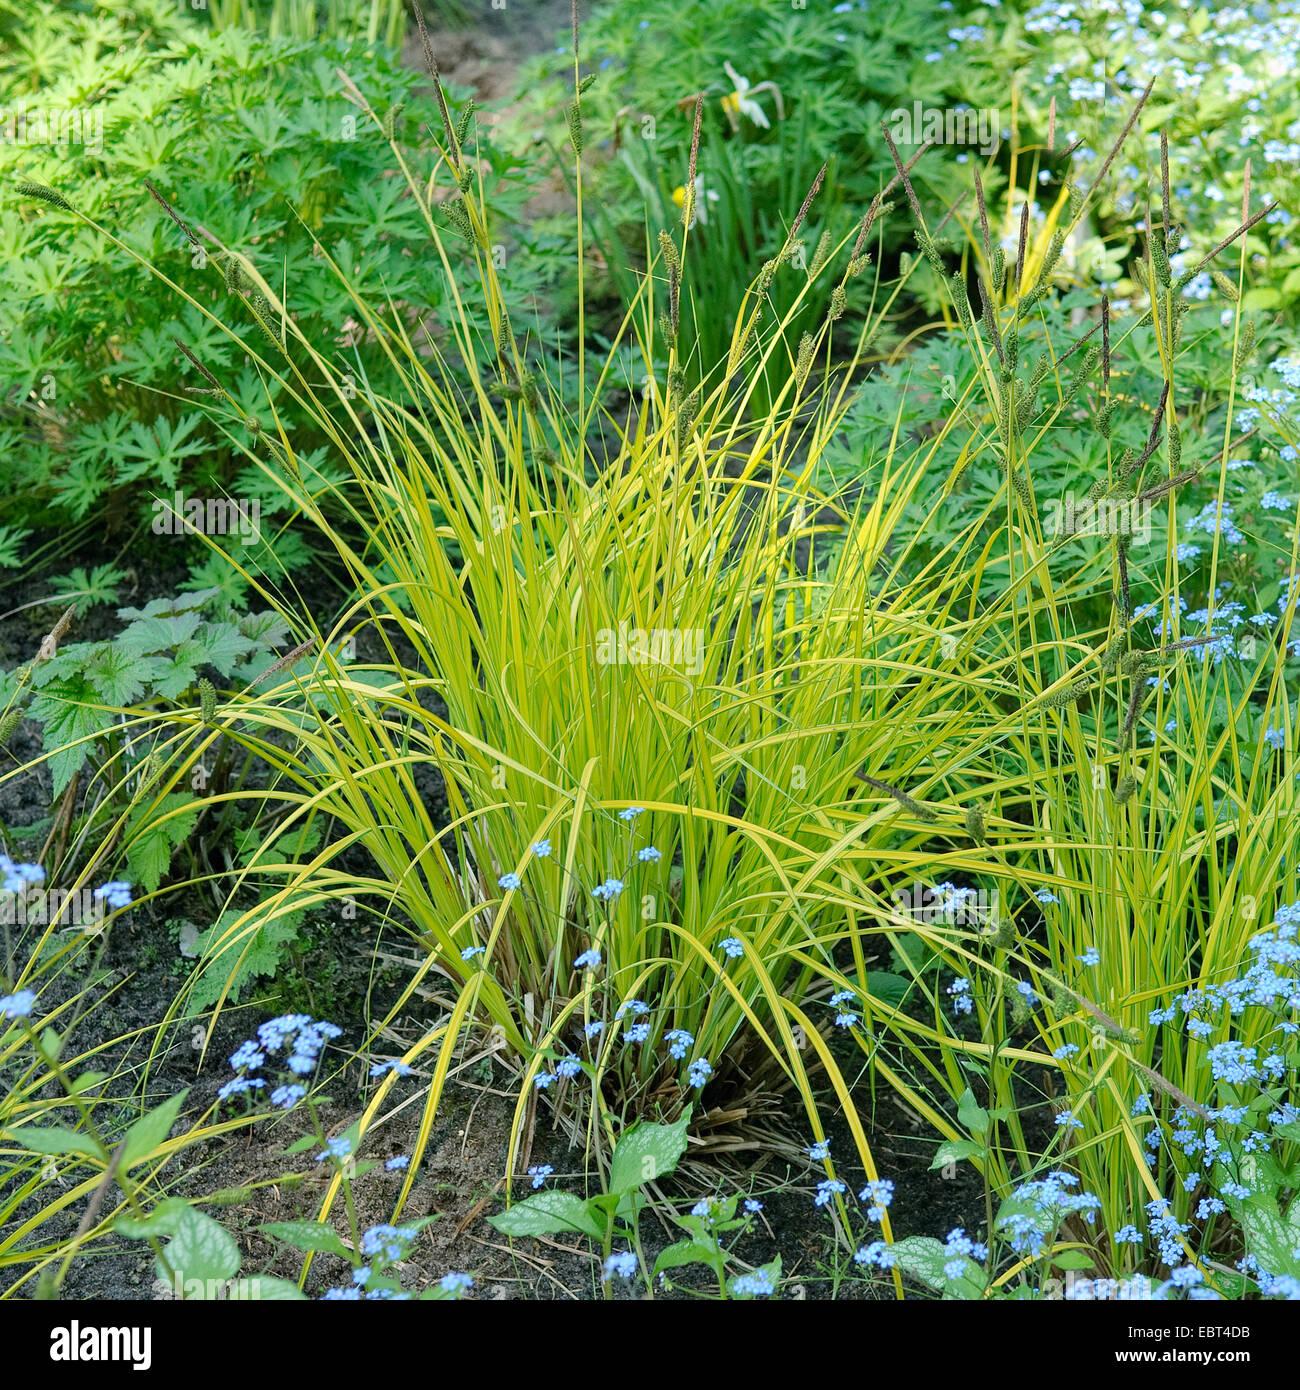 tufted sedge, tufted-sedge, tussock sedge (Carex elata 'Aurea', Carex elata Aurea), cultivar Aurea - Stock Image